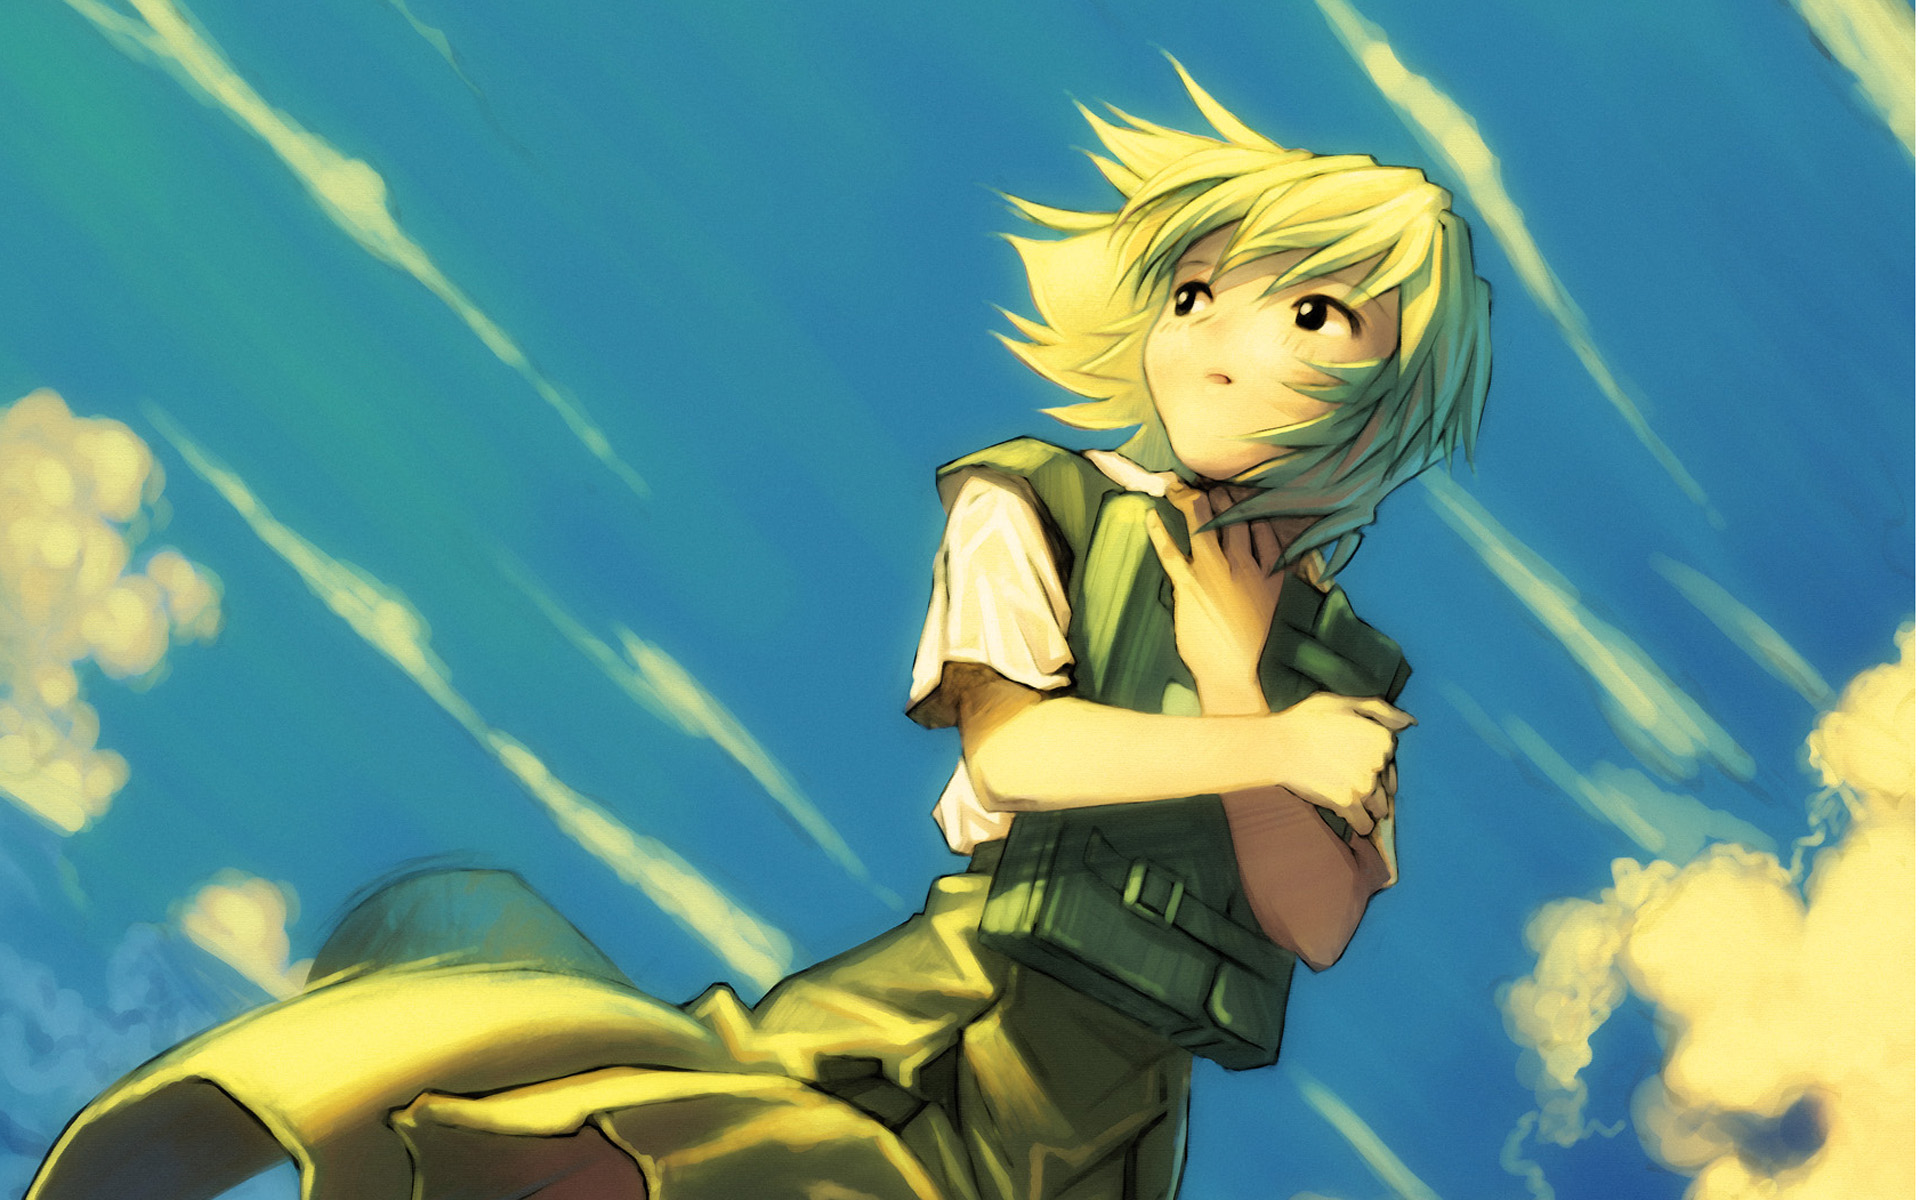 ayanami_rei kobayashi_yuji neon_genesis_evangelion short_hair sky